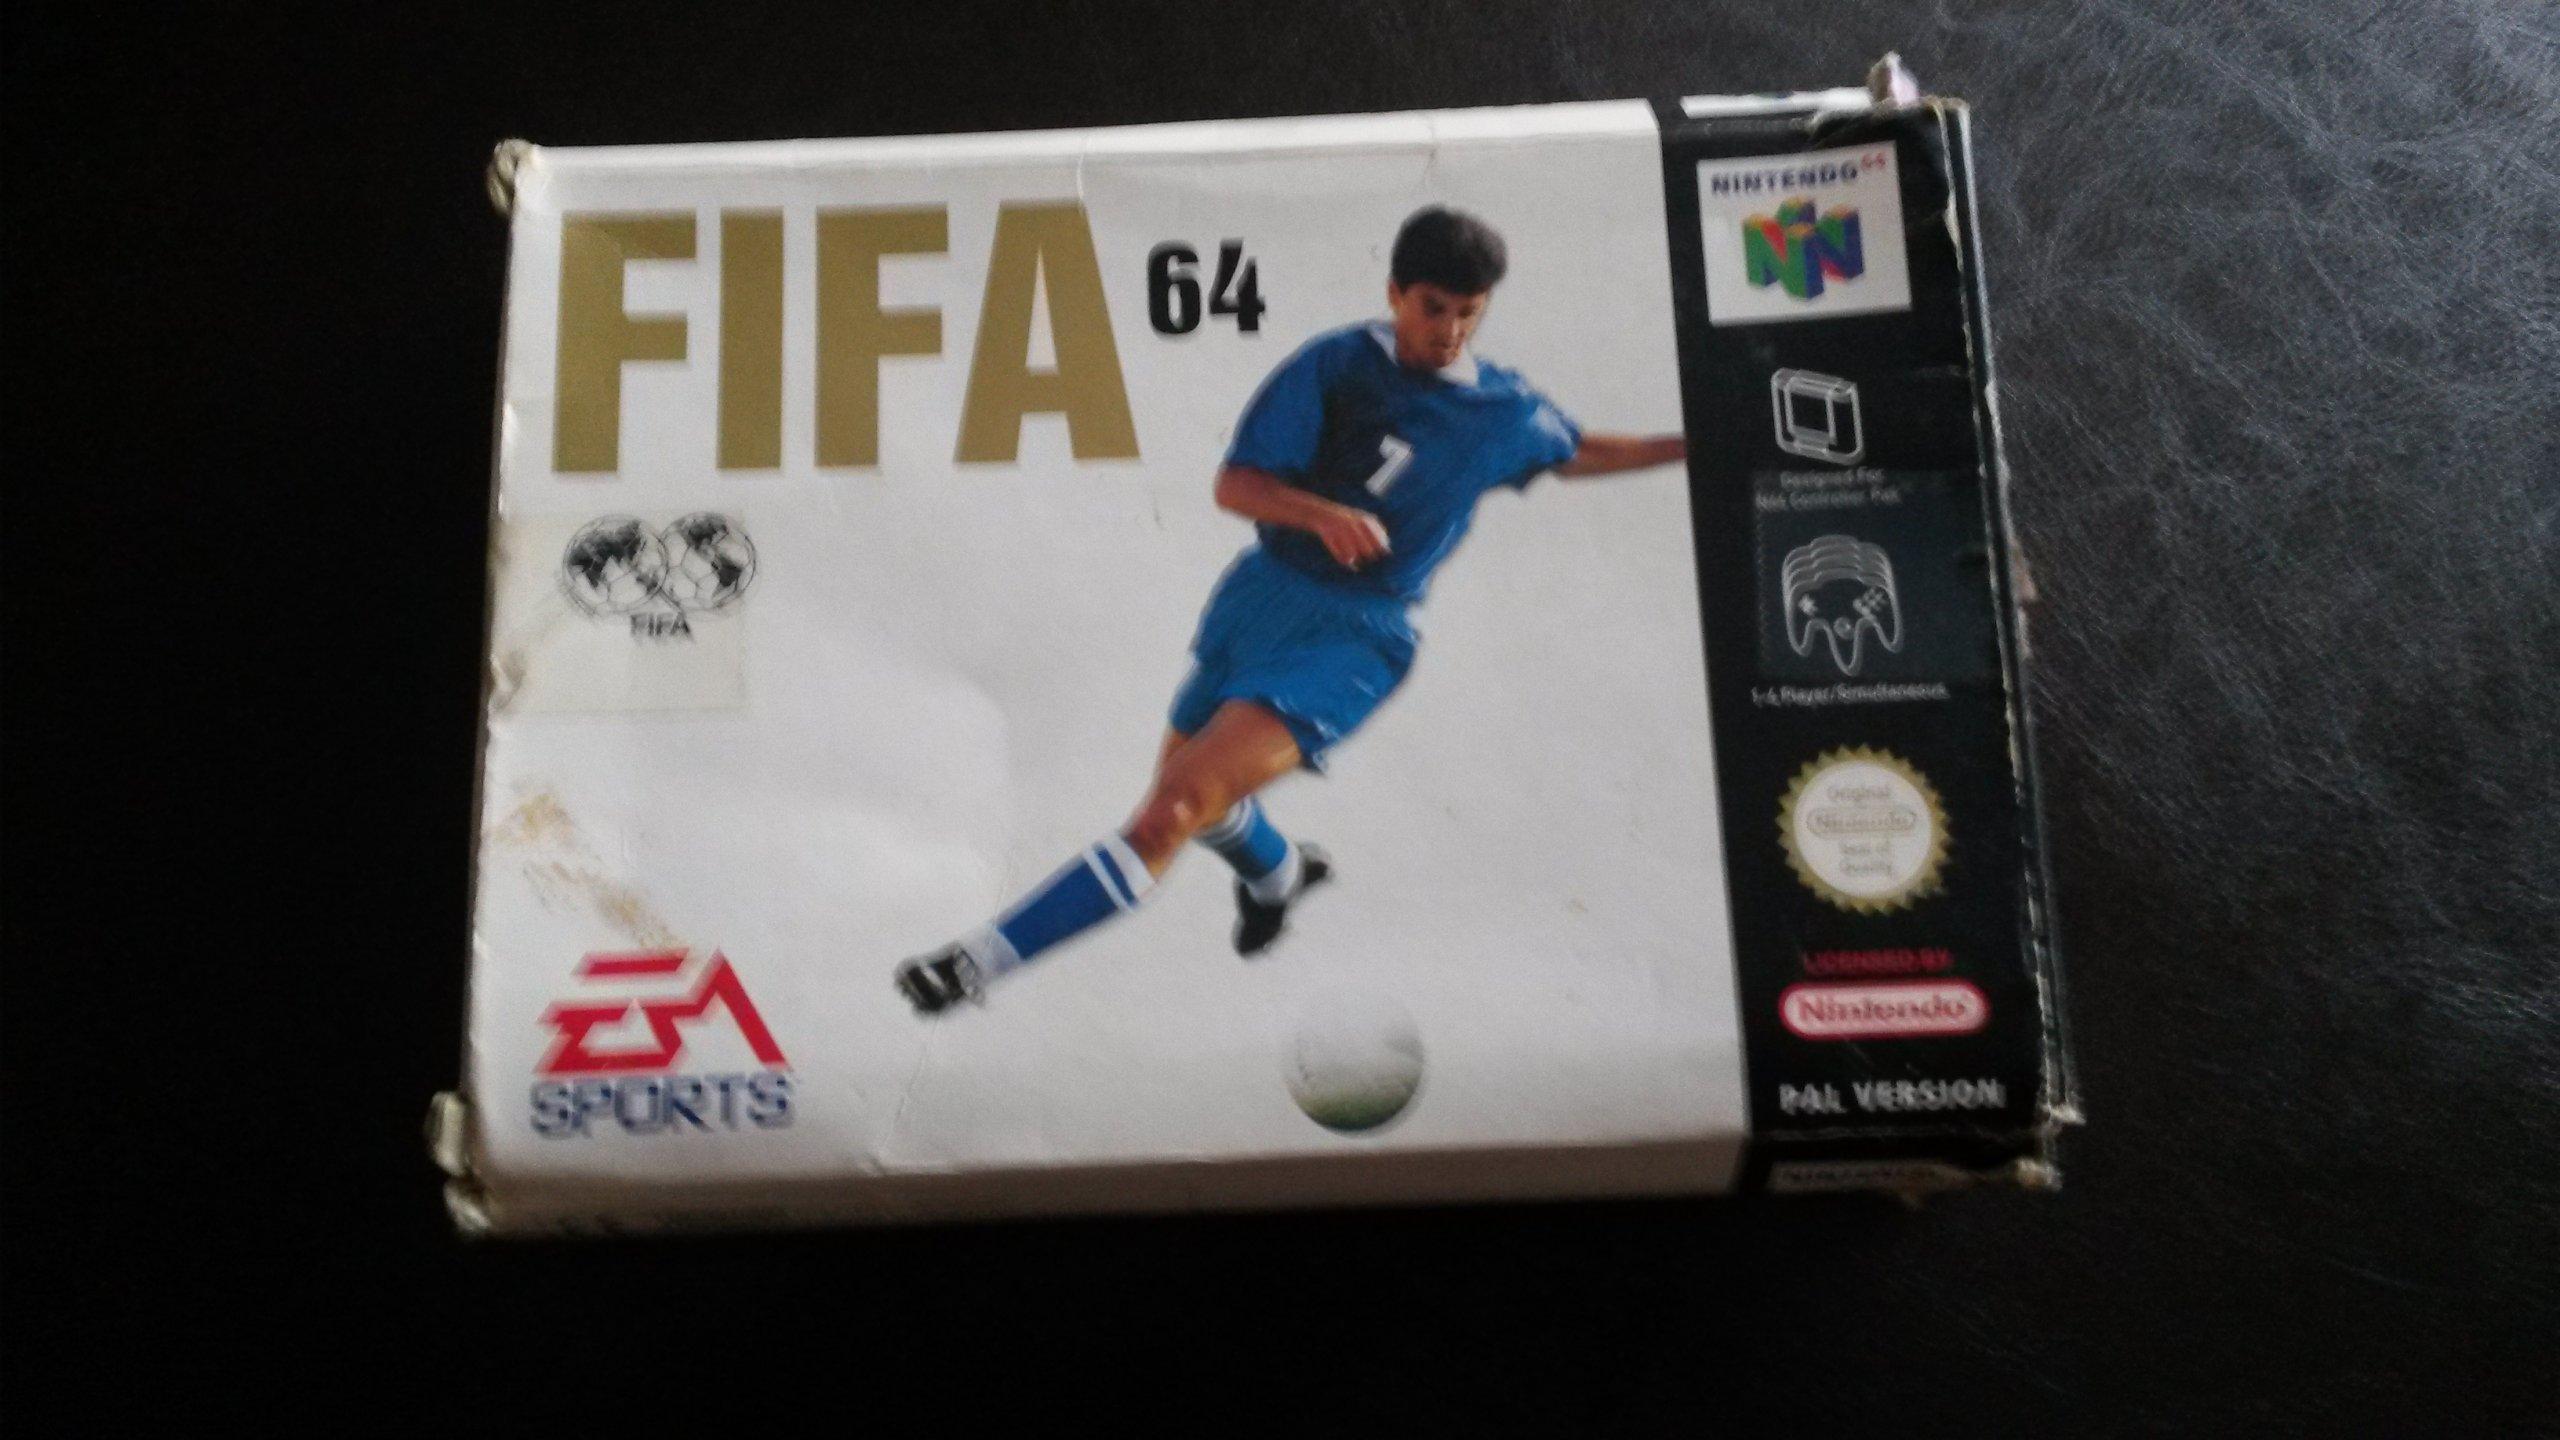 FIFA 64 = Nintendo 64